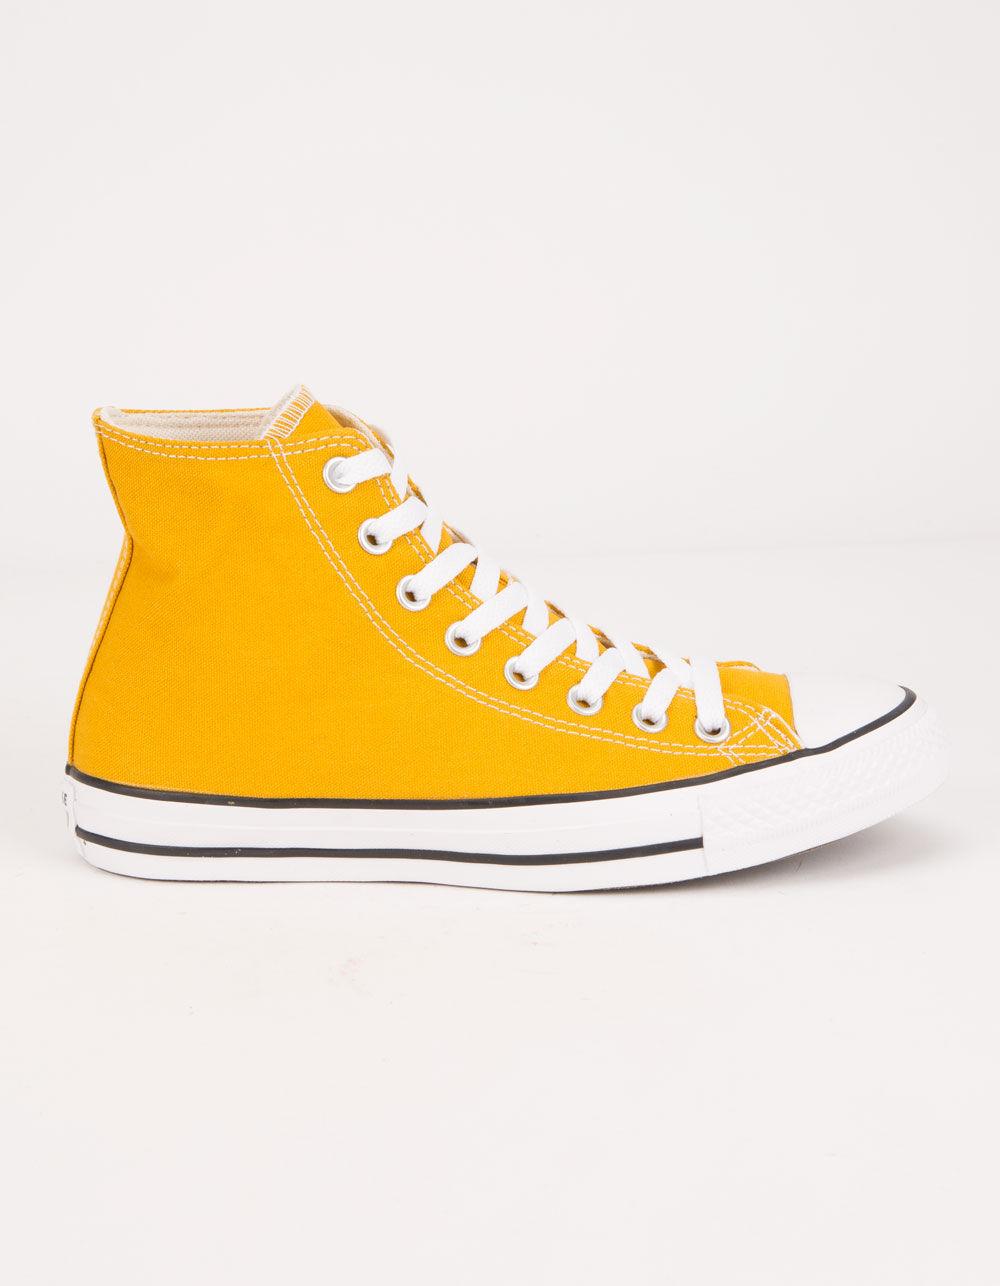 CONVERSE Chuck Taylor All Star Seasonal Color Gold Dart High Top Shoes